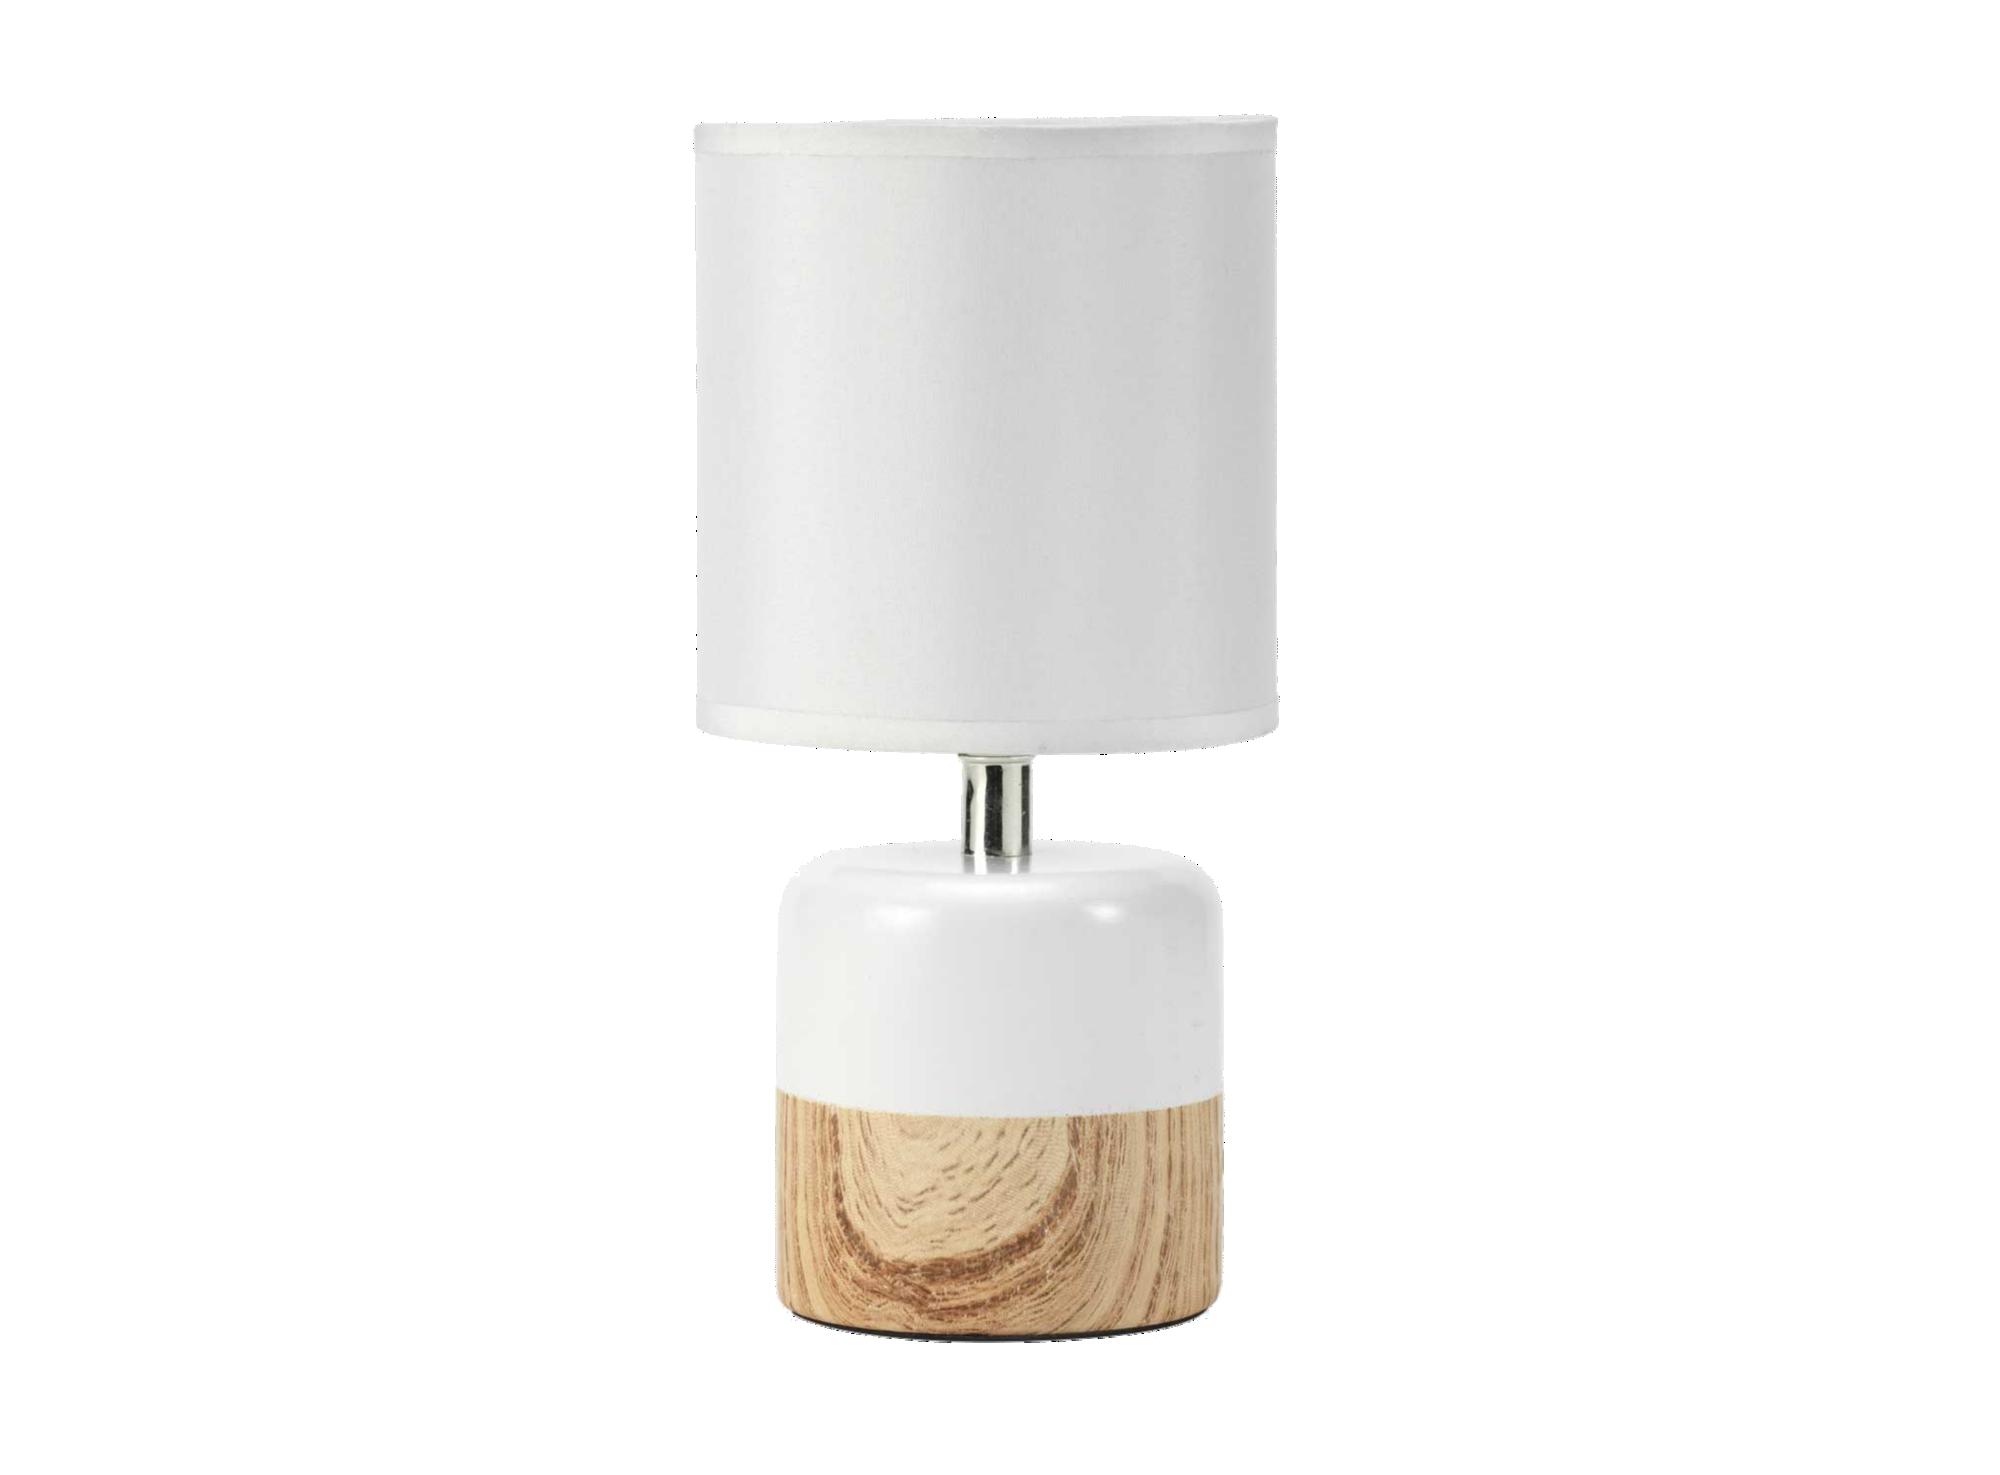 Lampe d13h27 blanc/naturel pied :  en ceramique, ceramique imitation  ...